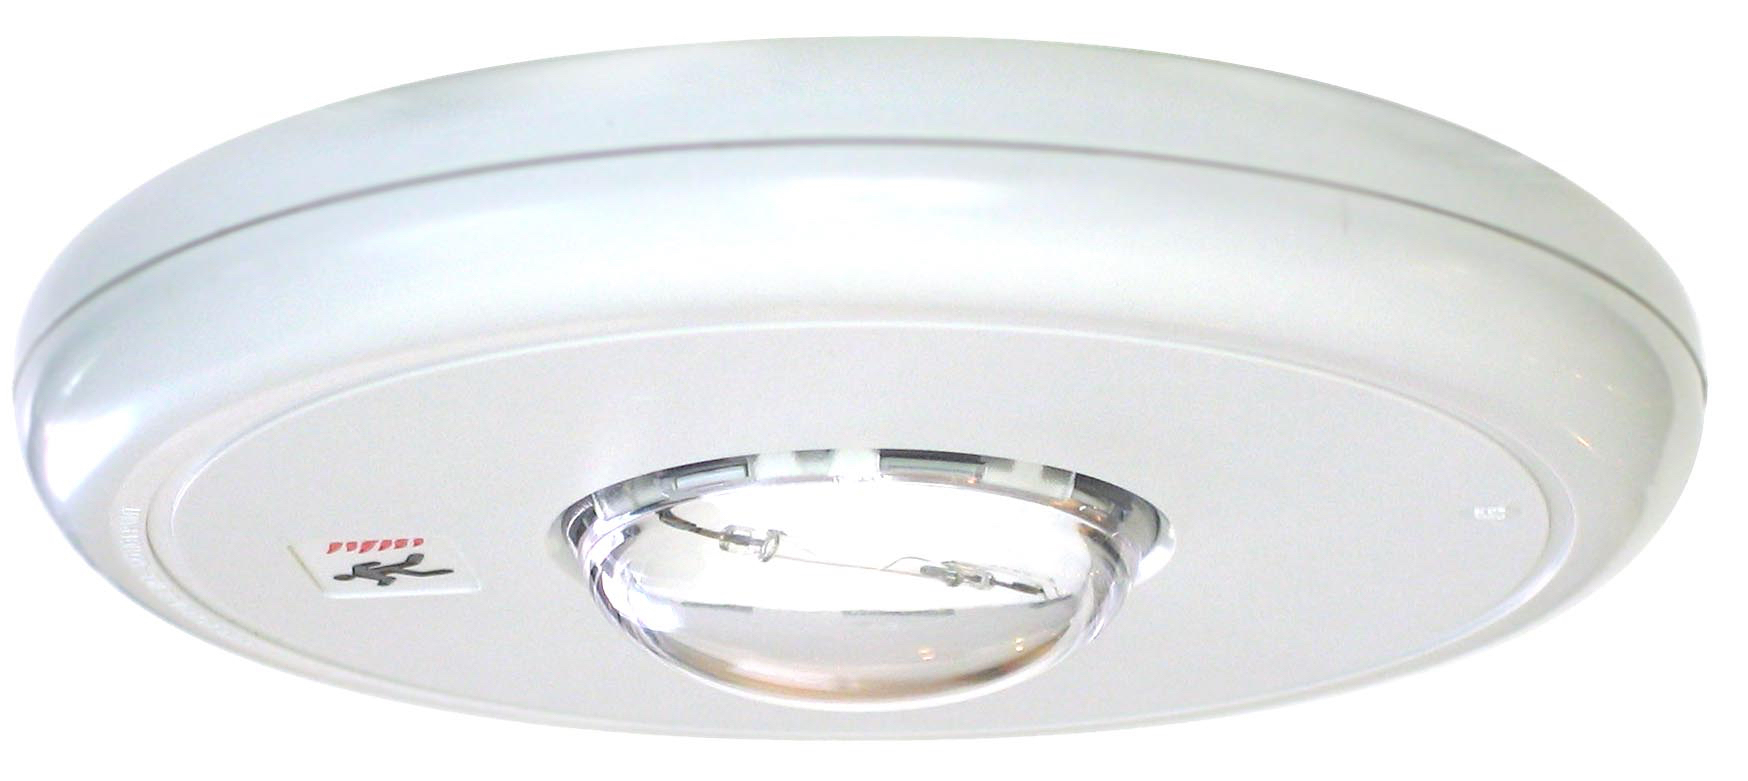 hight resolution of gcf vmgenesis ceiling strobe 15 95 multi cd fire marking mounts to 4 inch square x 2 1 8 inch box